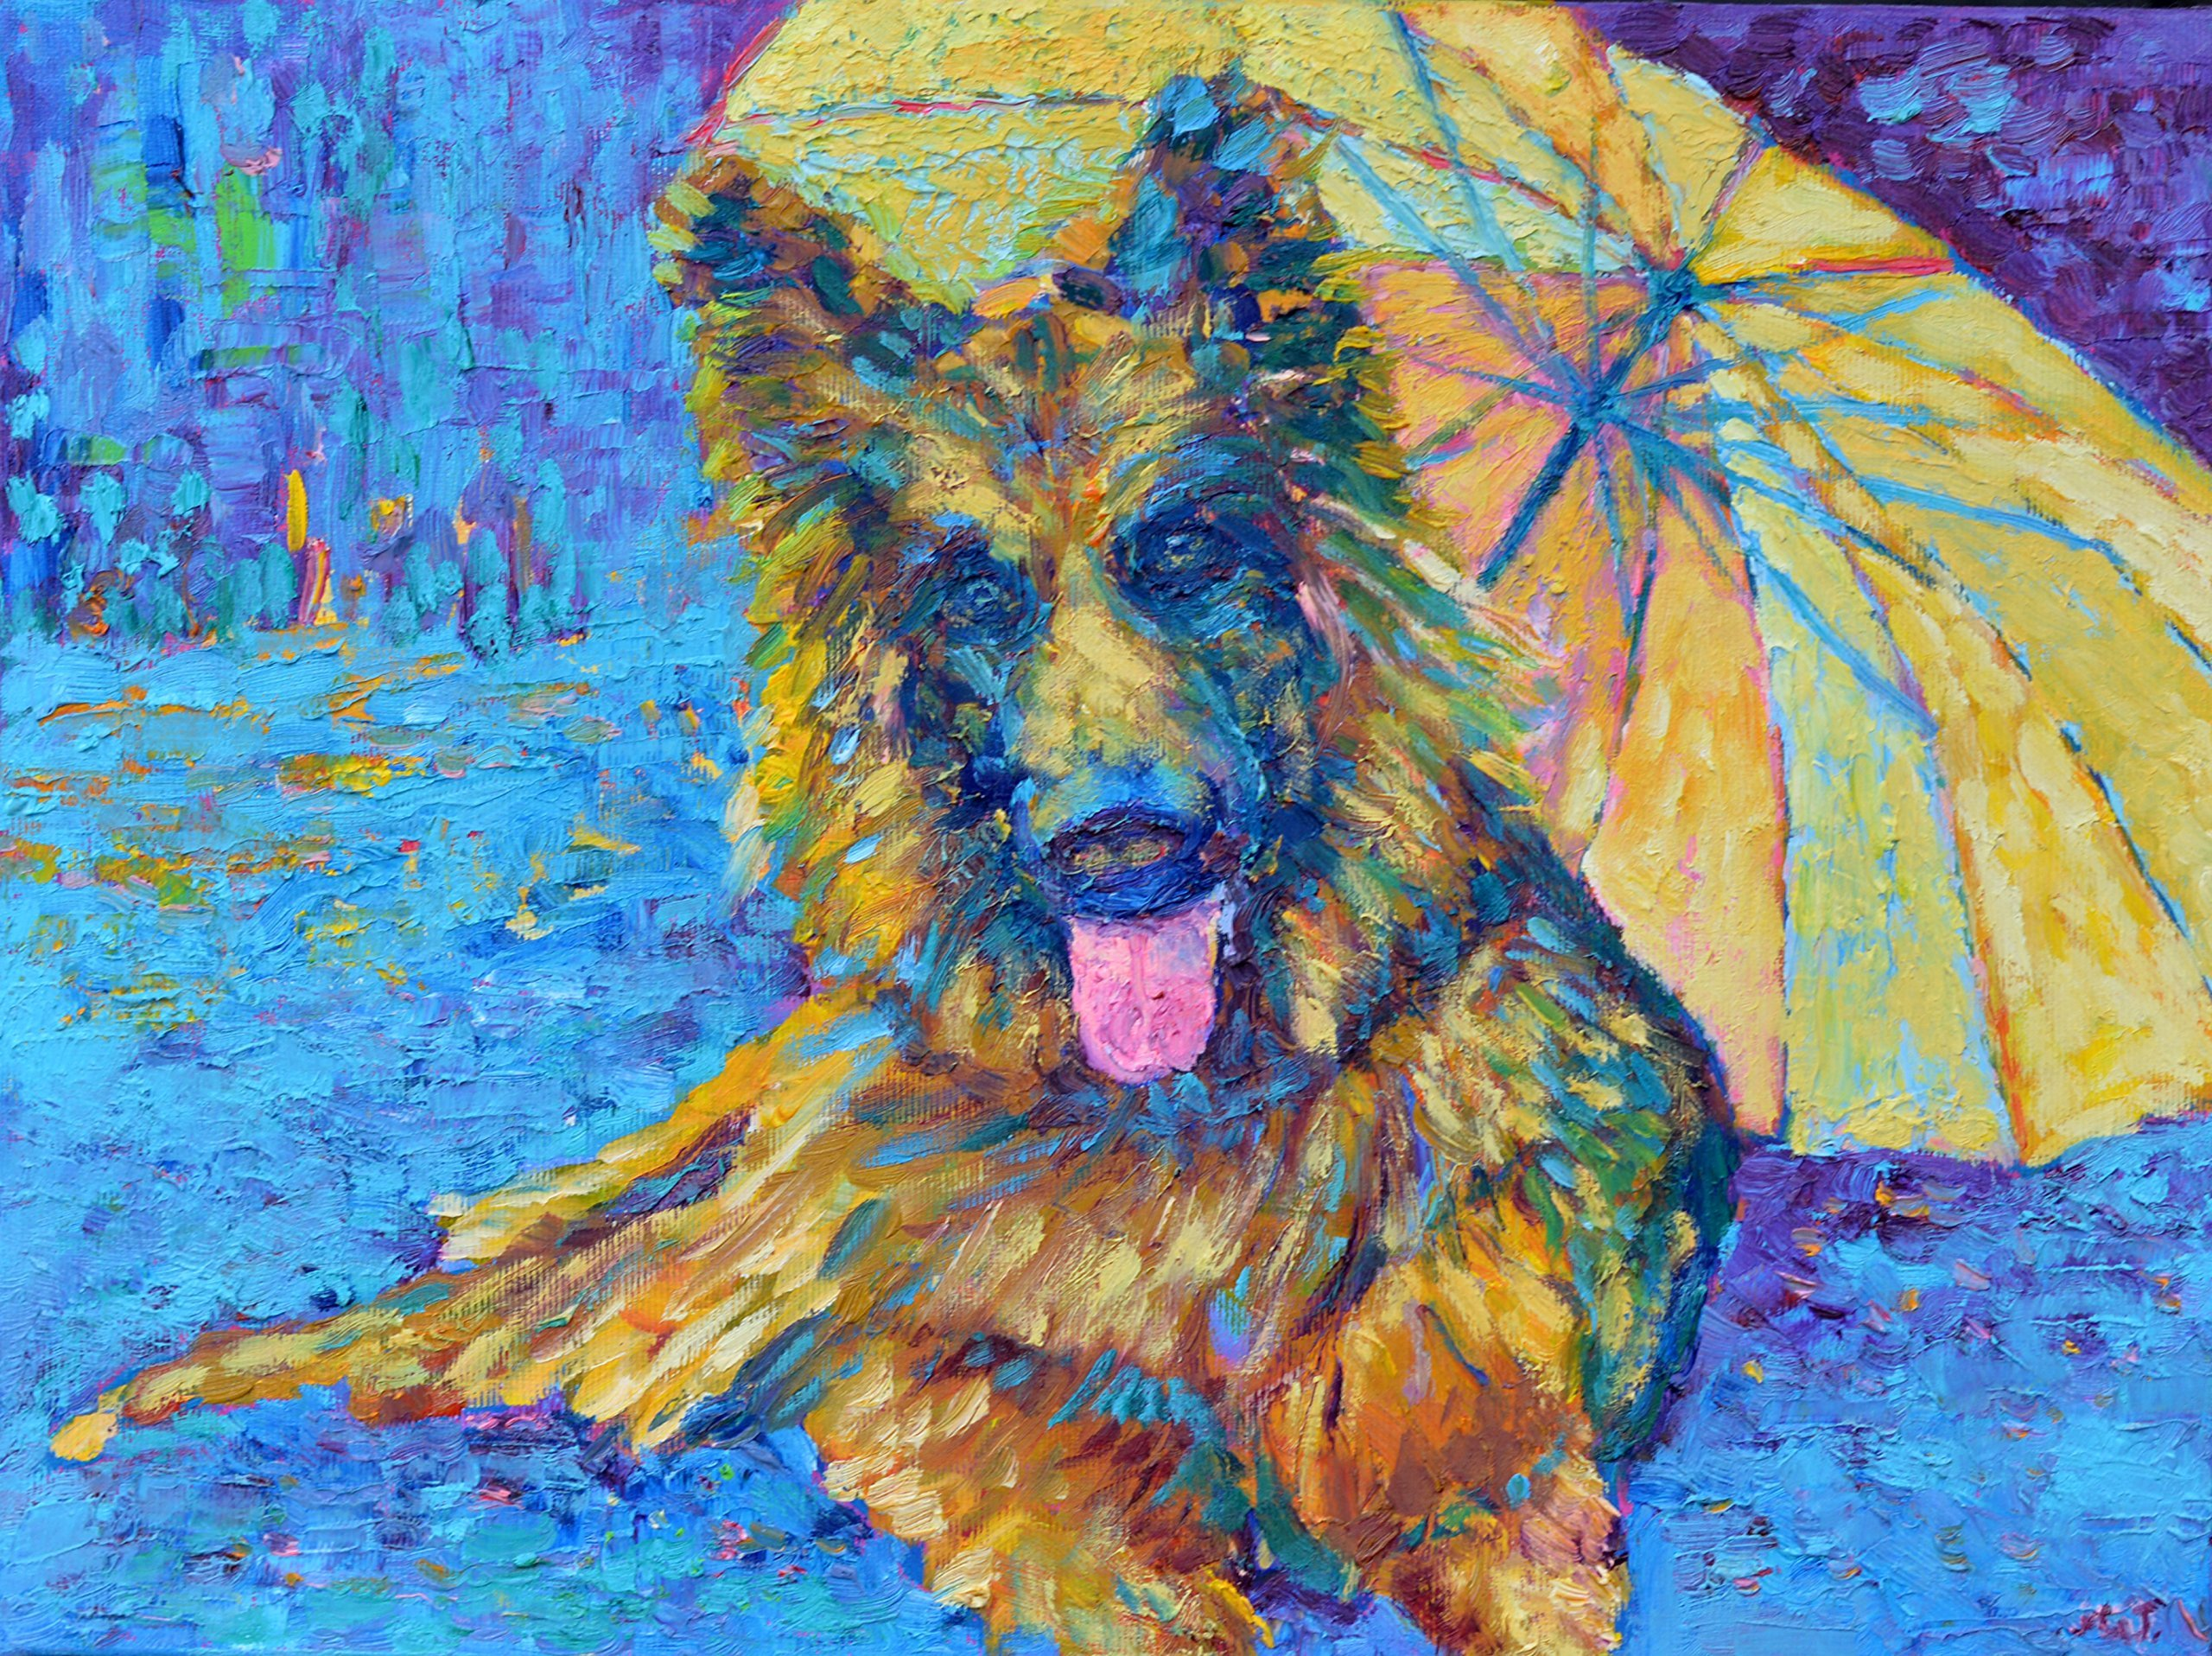 Dog Painting Pet Wall Art Animal Portraits OIL ON CANVAS Original Genuine Hand Painted Impressionist